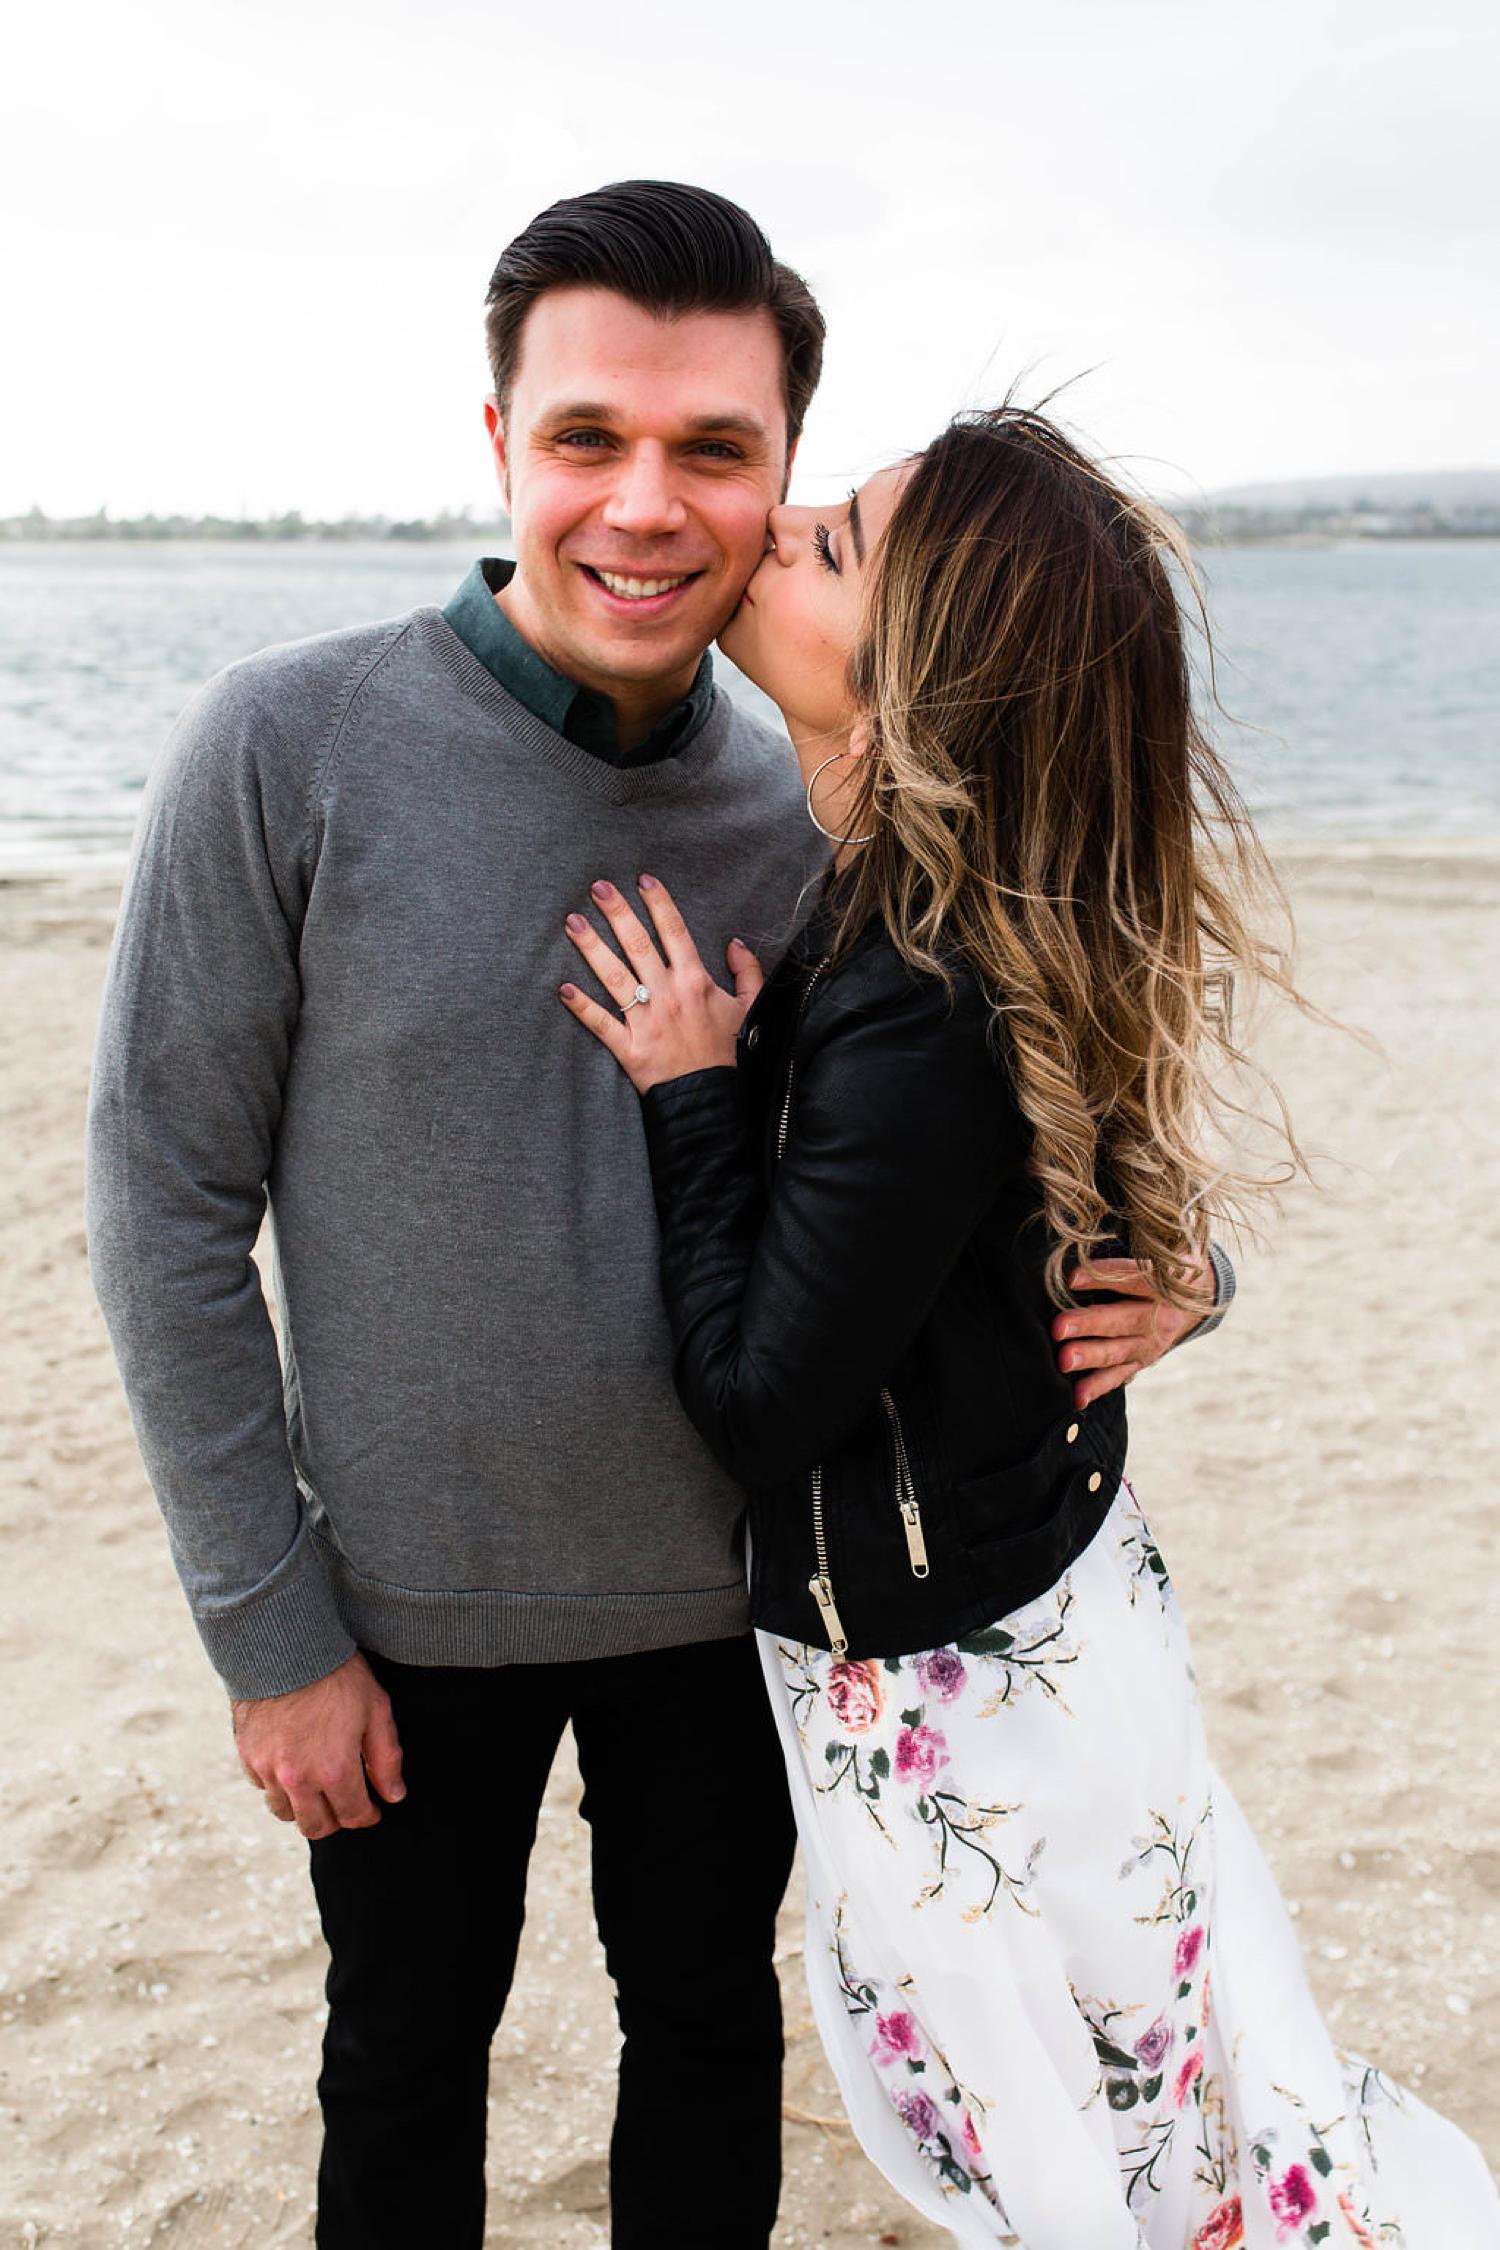 Image 5 of Nadia and Brett